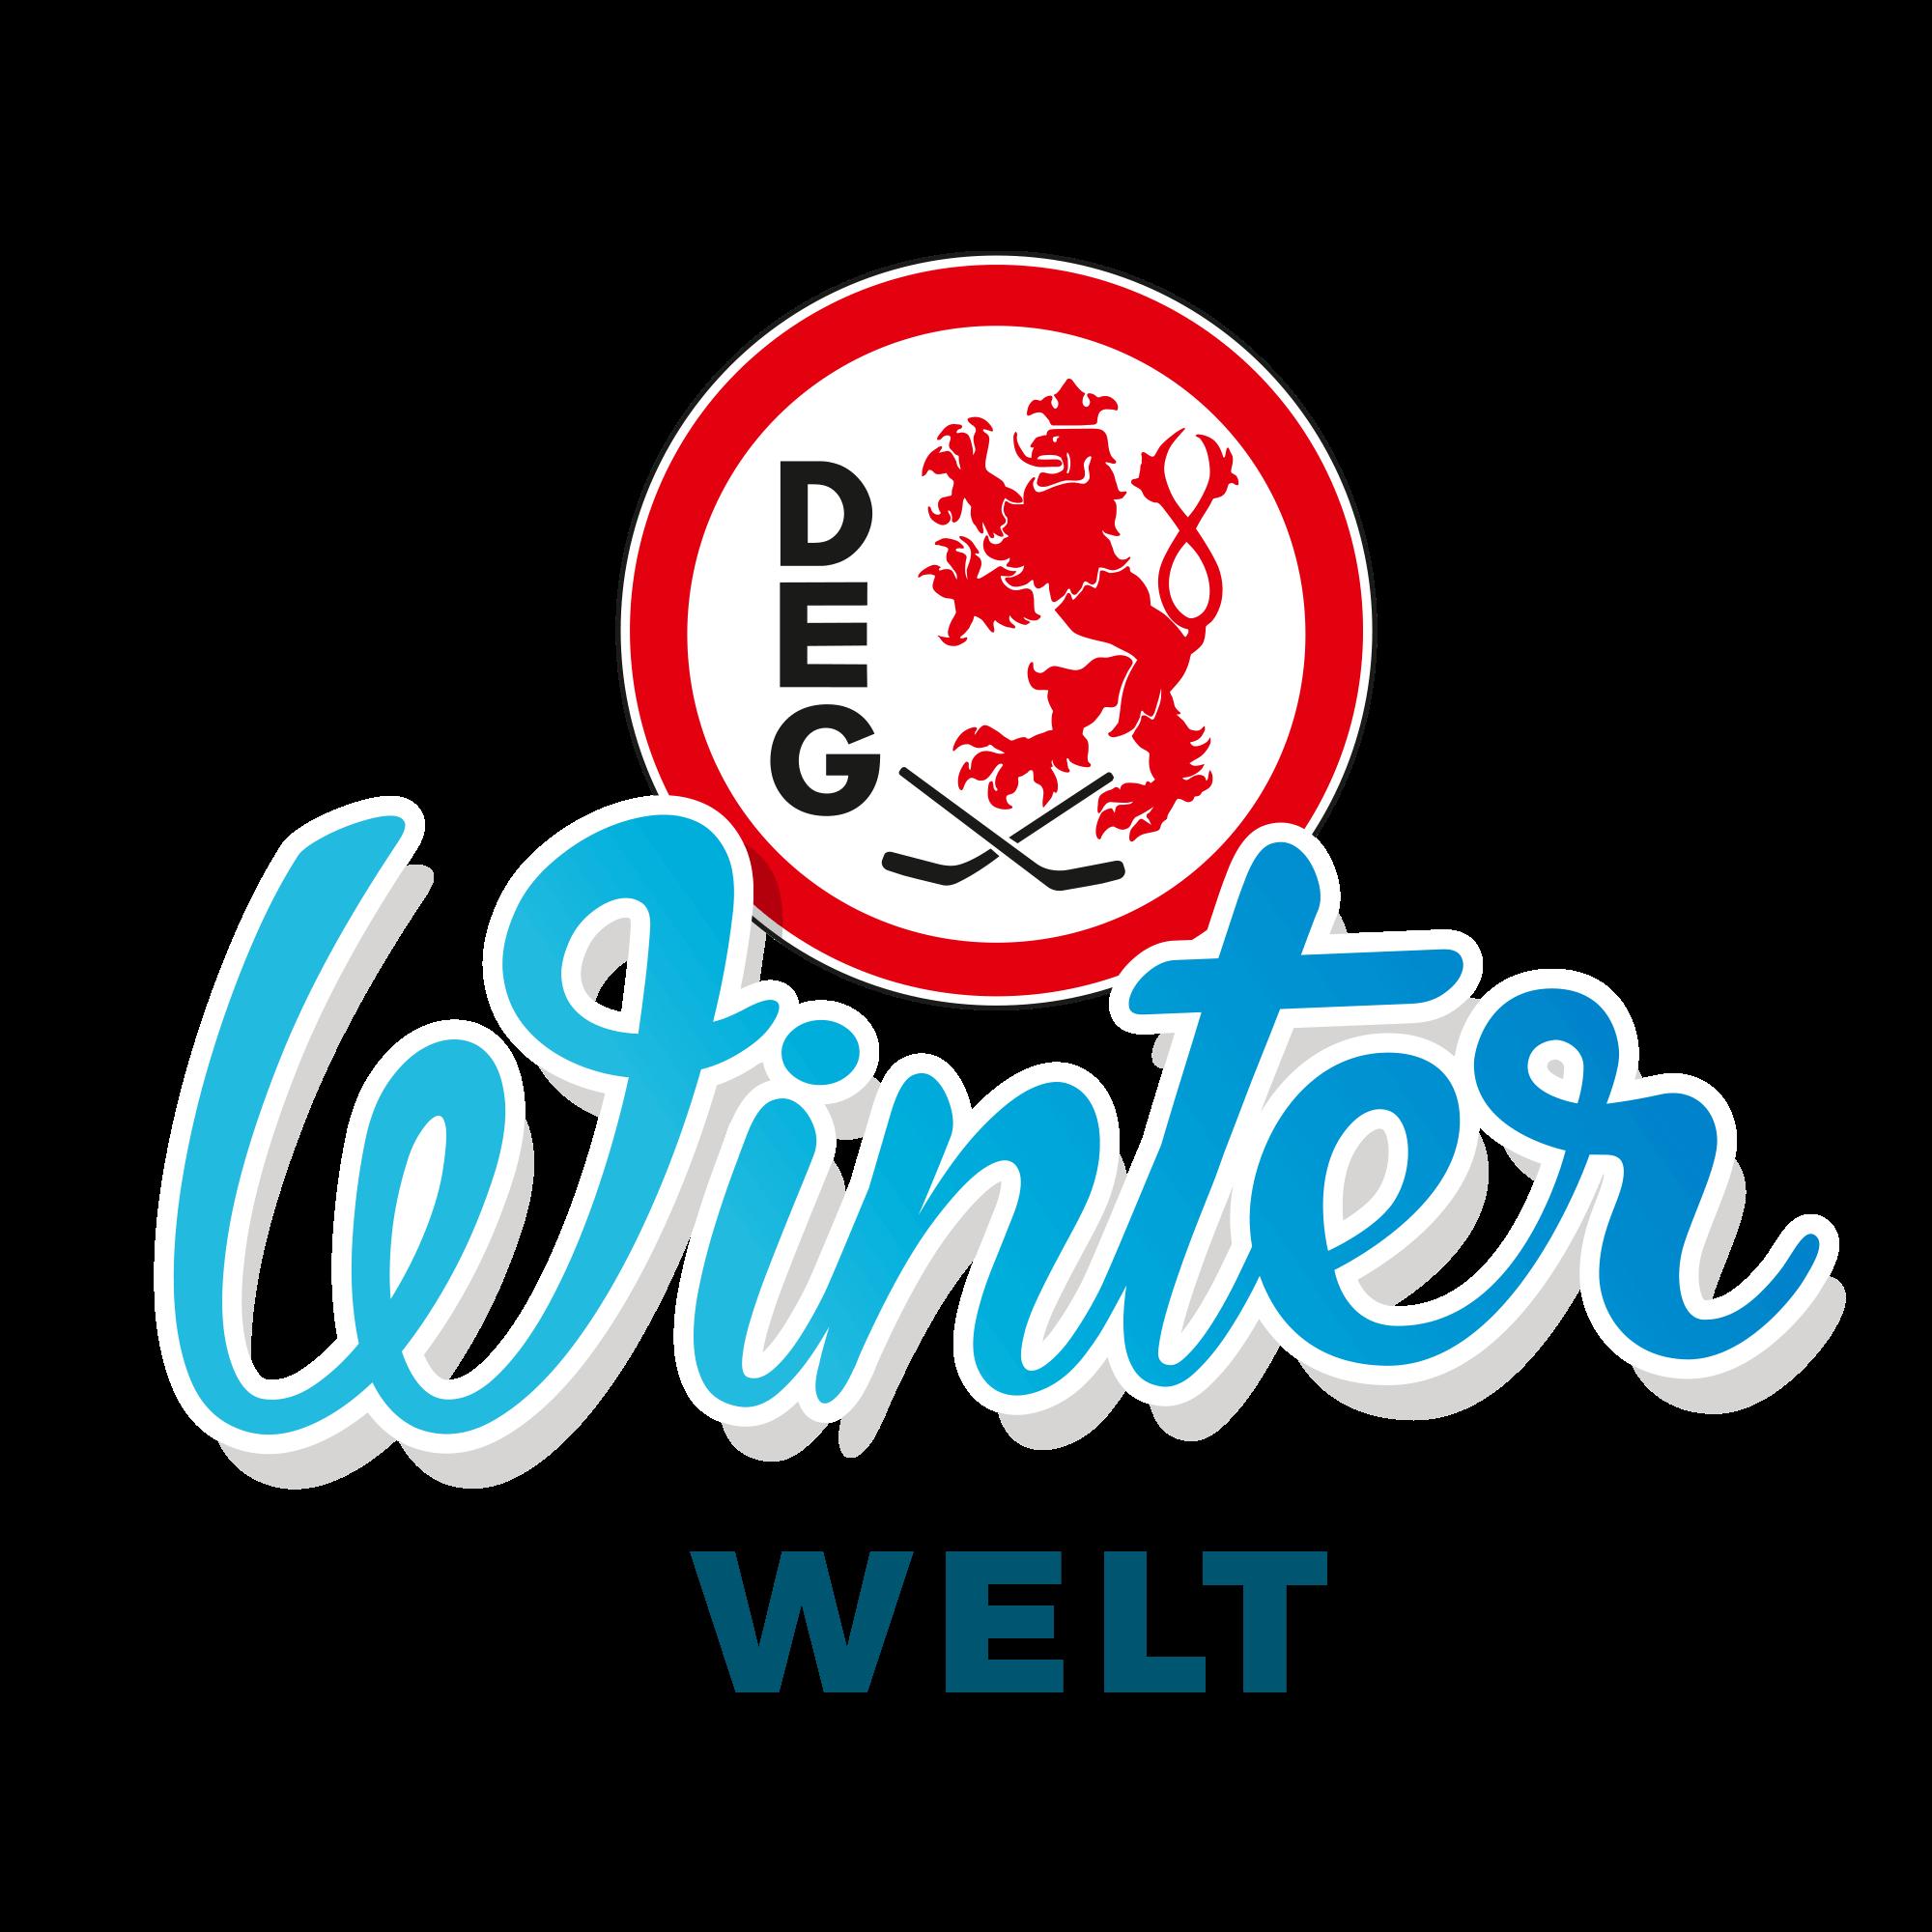 DEG-Winterwelt-logo